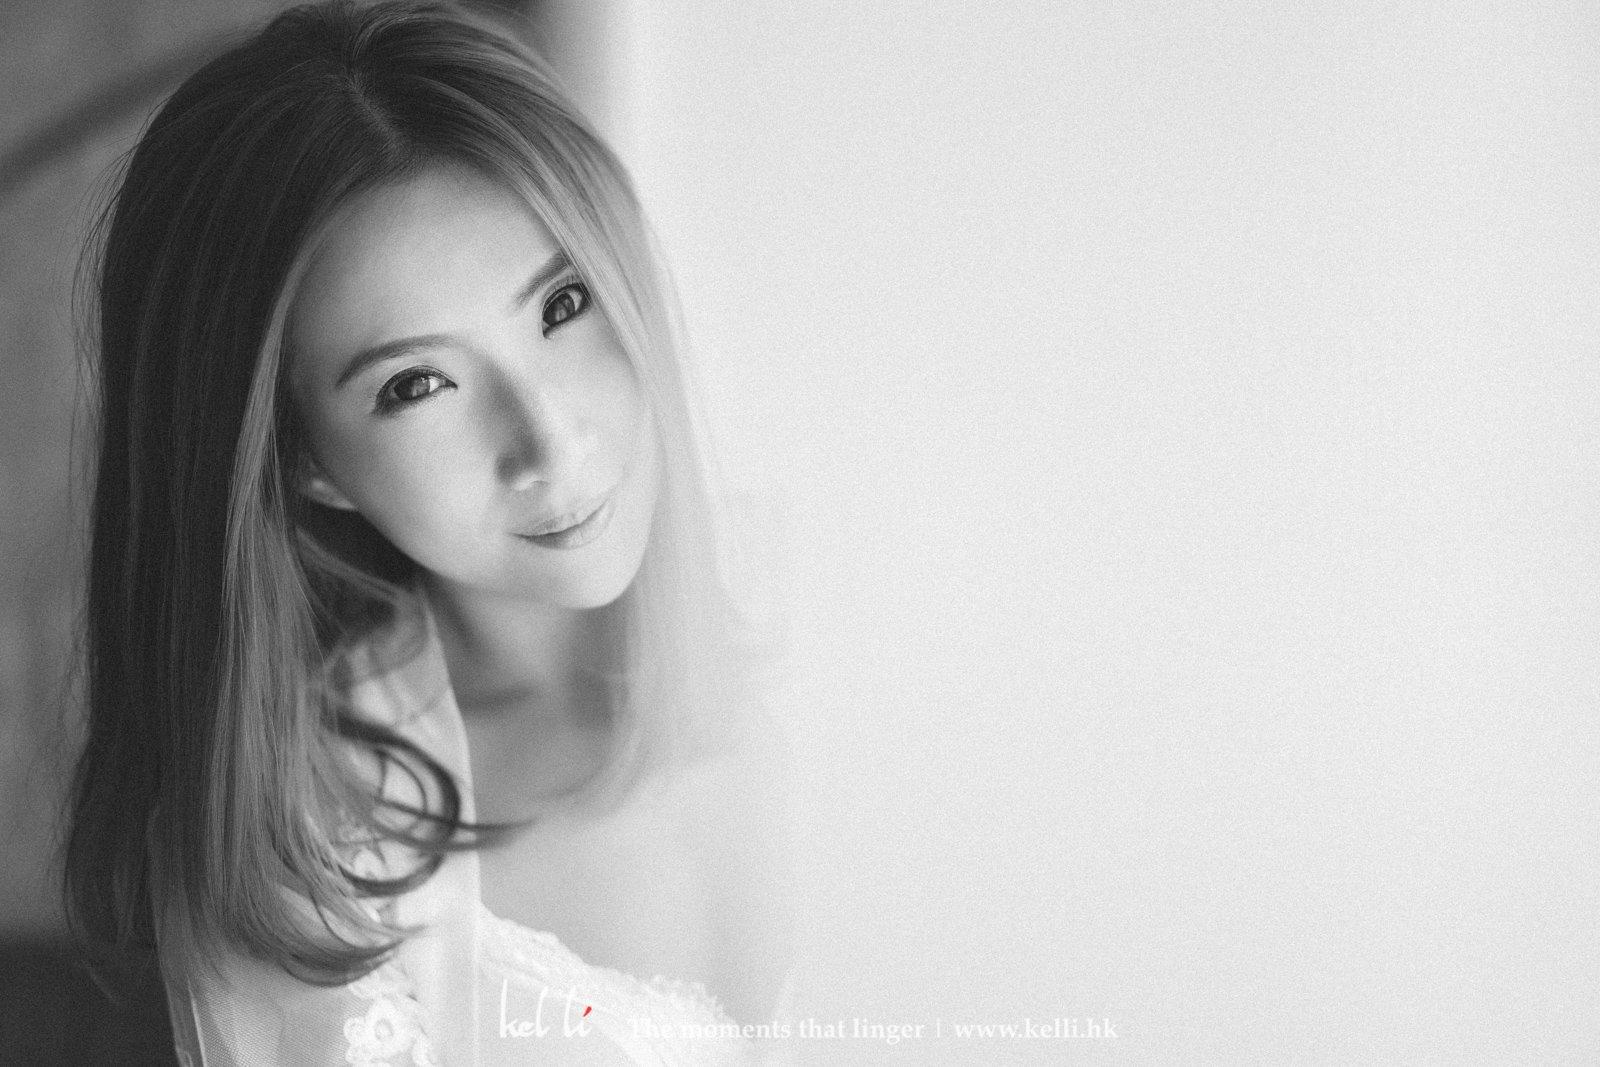 閨房攝影 | Boudoir photography